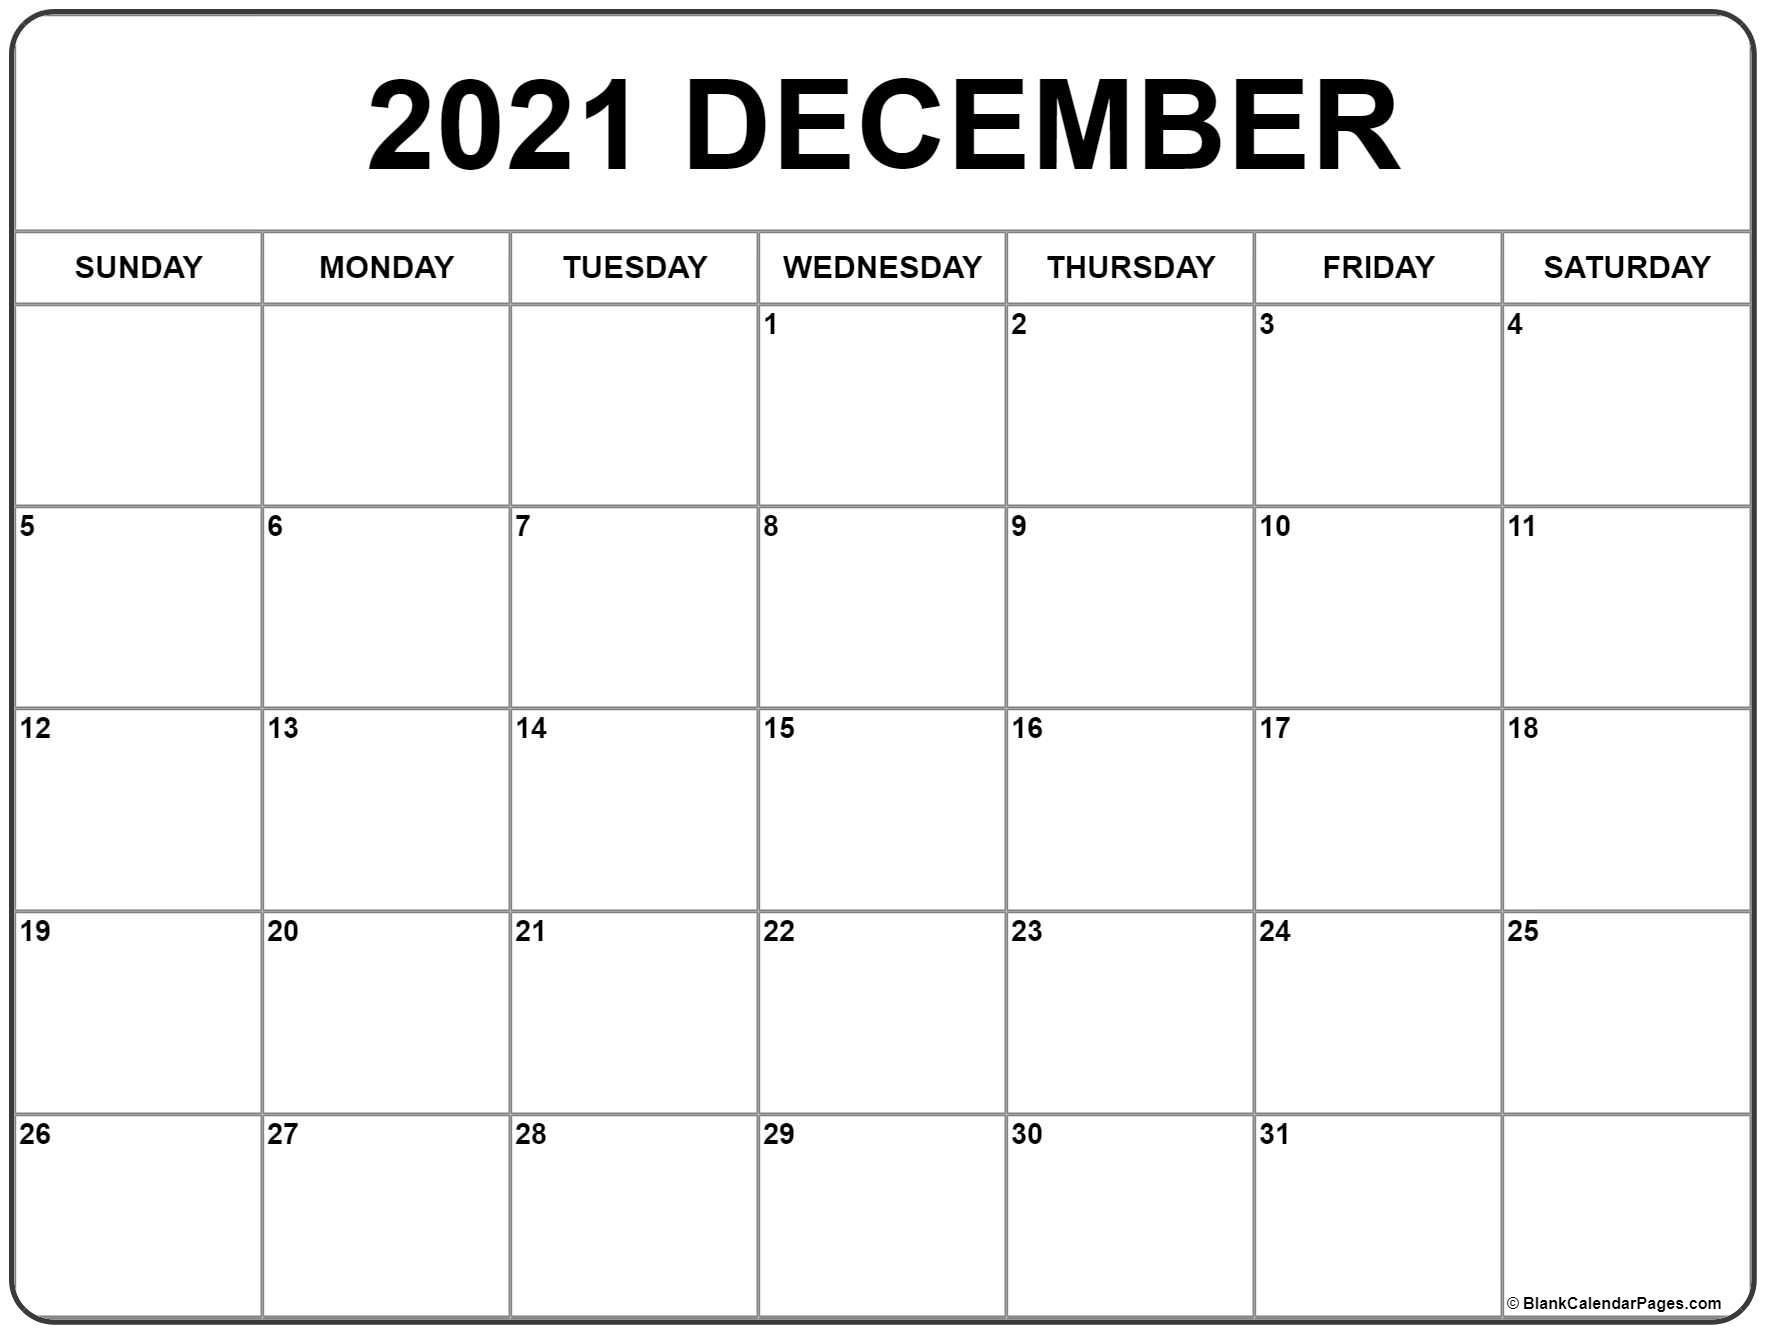 December 2021 Calendar | Free Printable Monthly Calendars  Free Printable Bill Calendar 2021